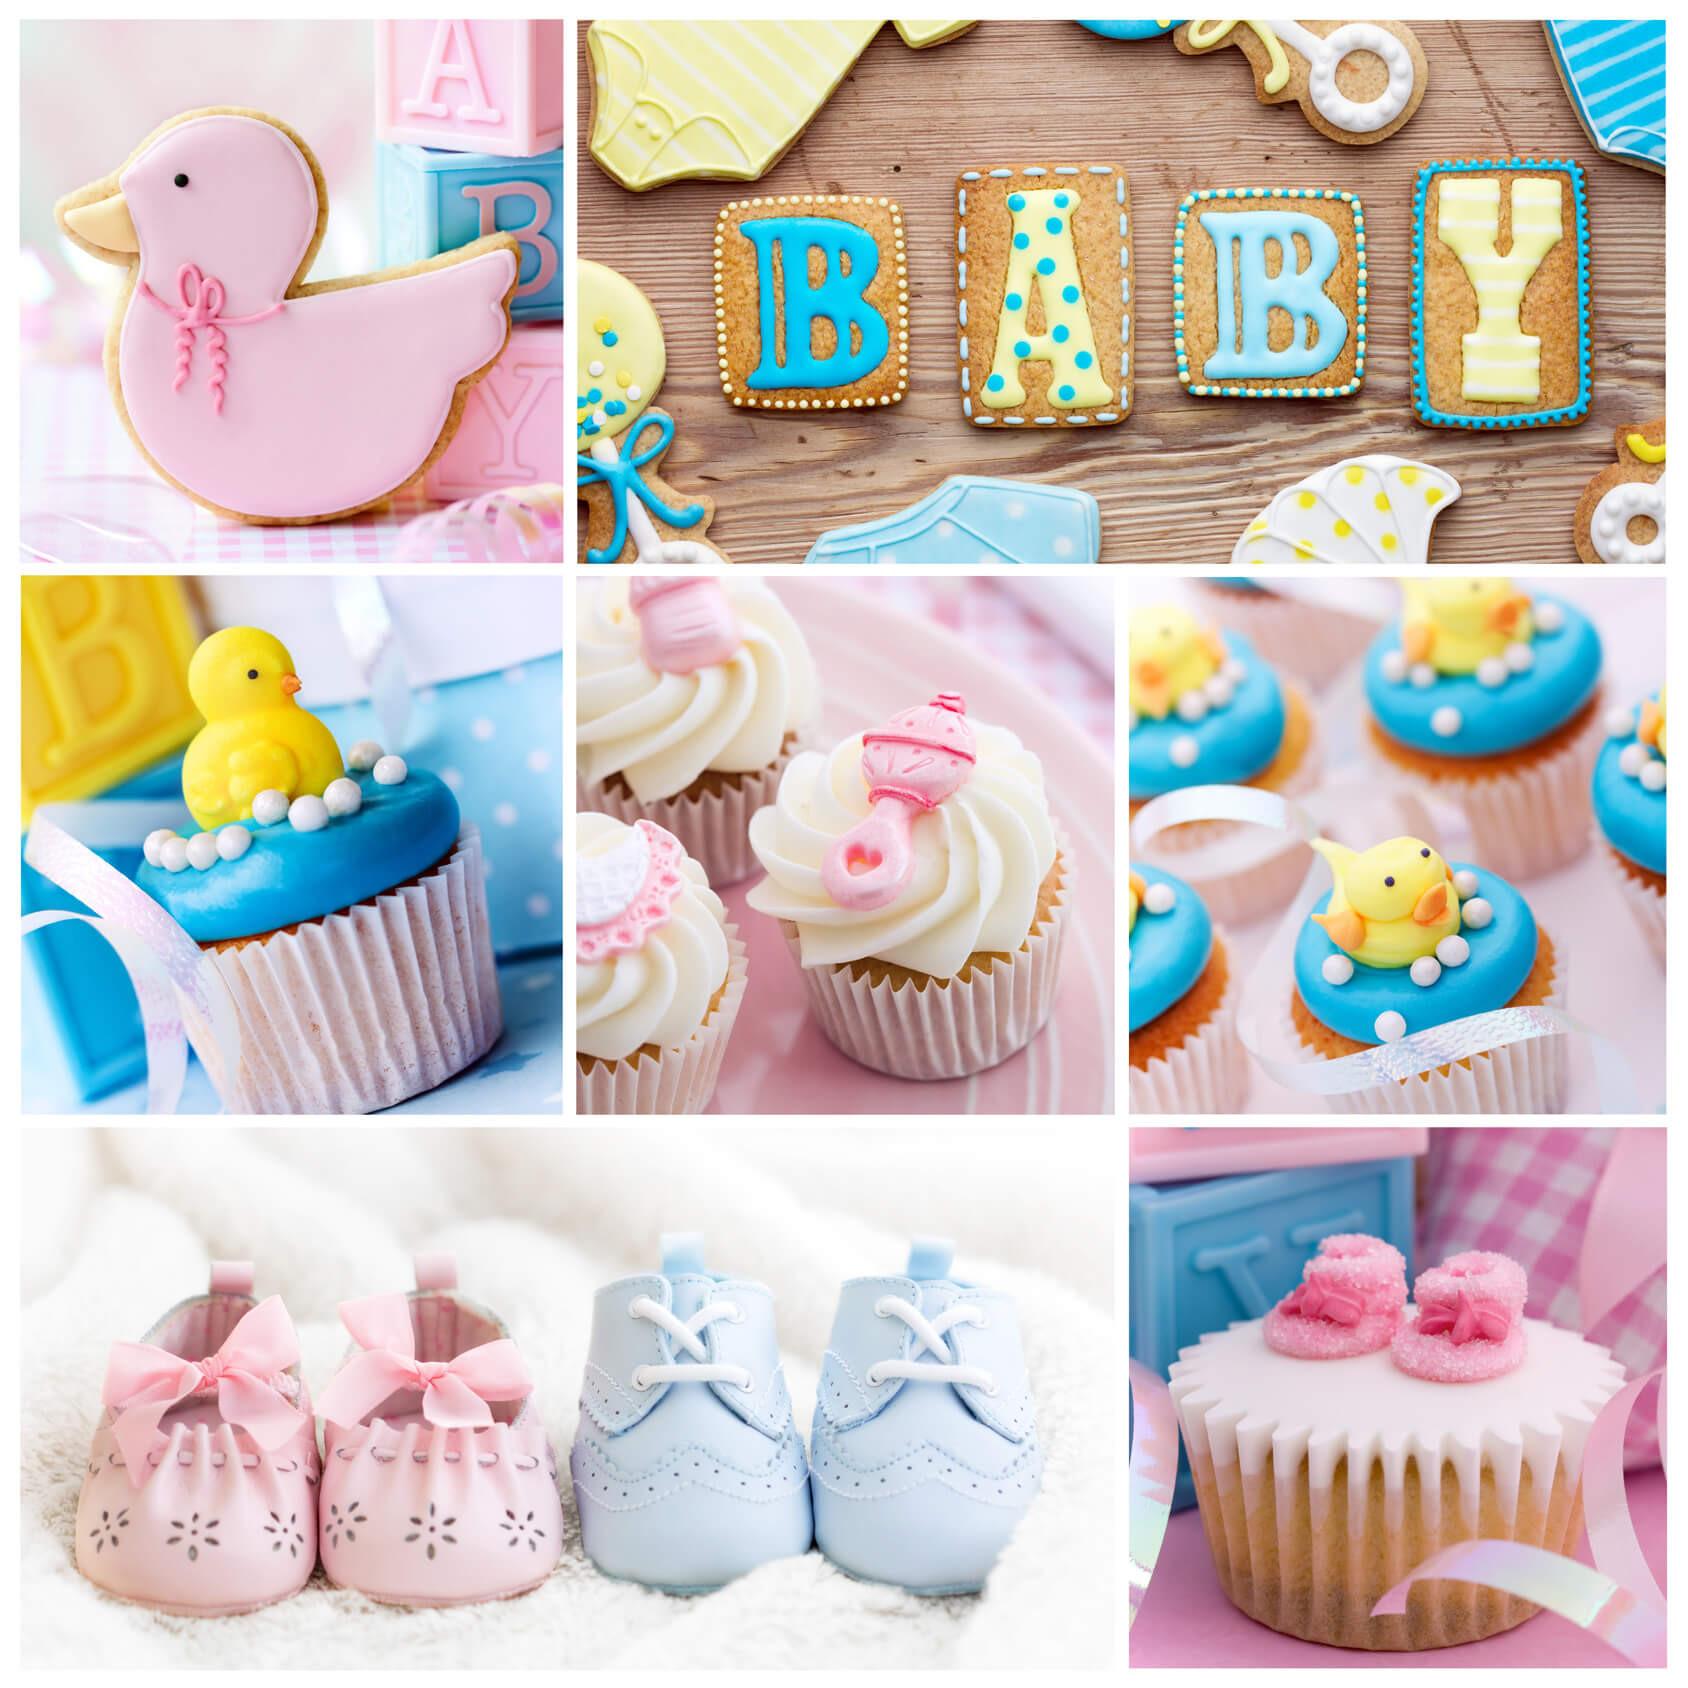 Geschenkideen Babyparty  Geschenke zur Geburt kreative Geschenkideen zur Geburt